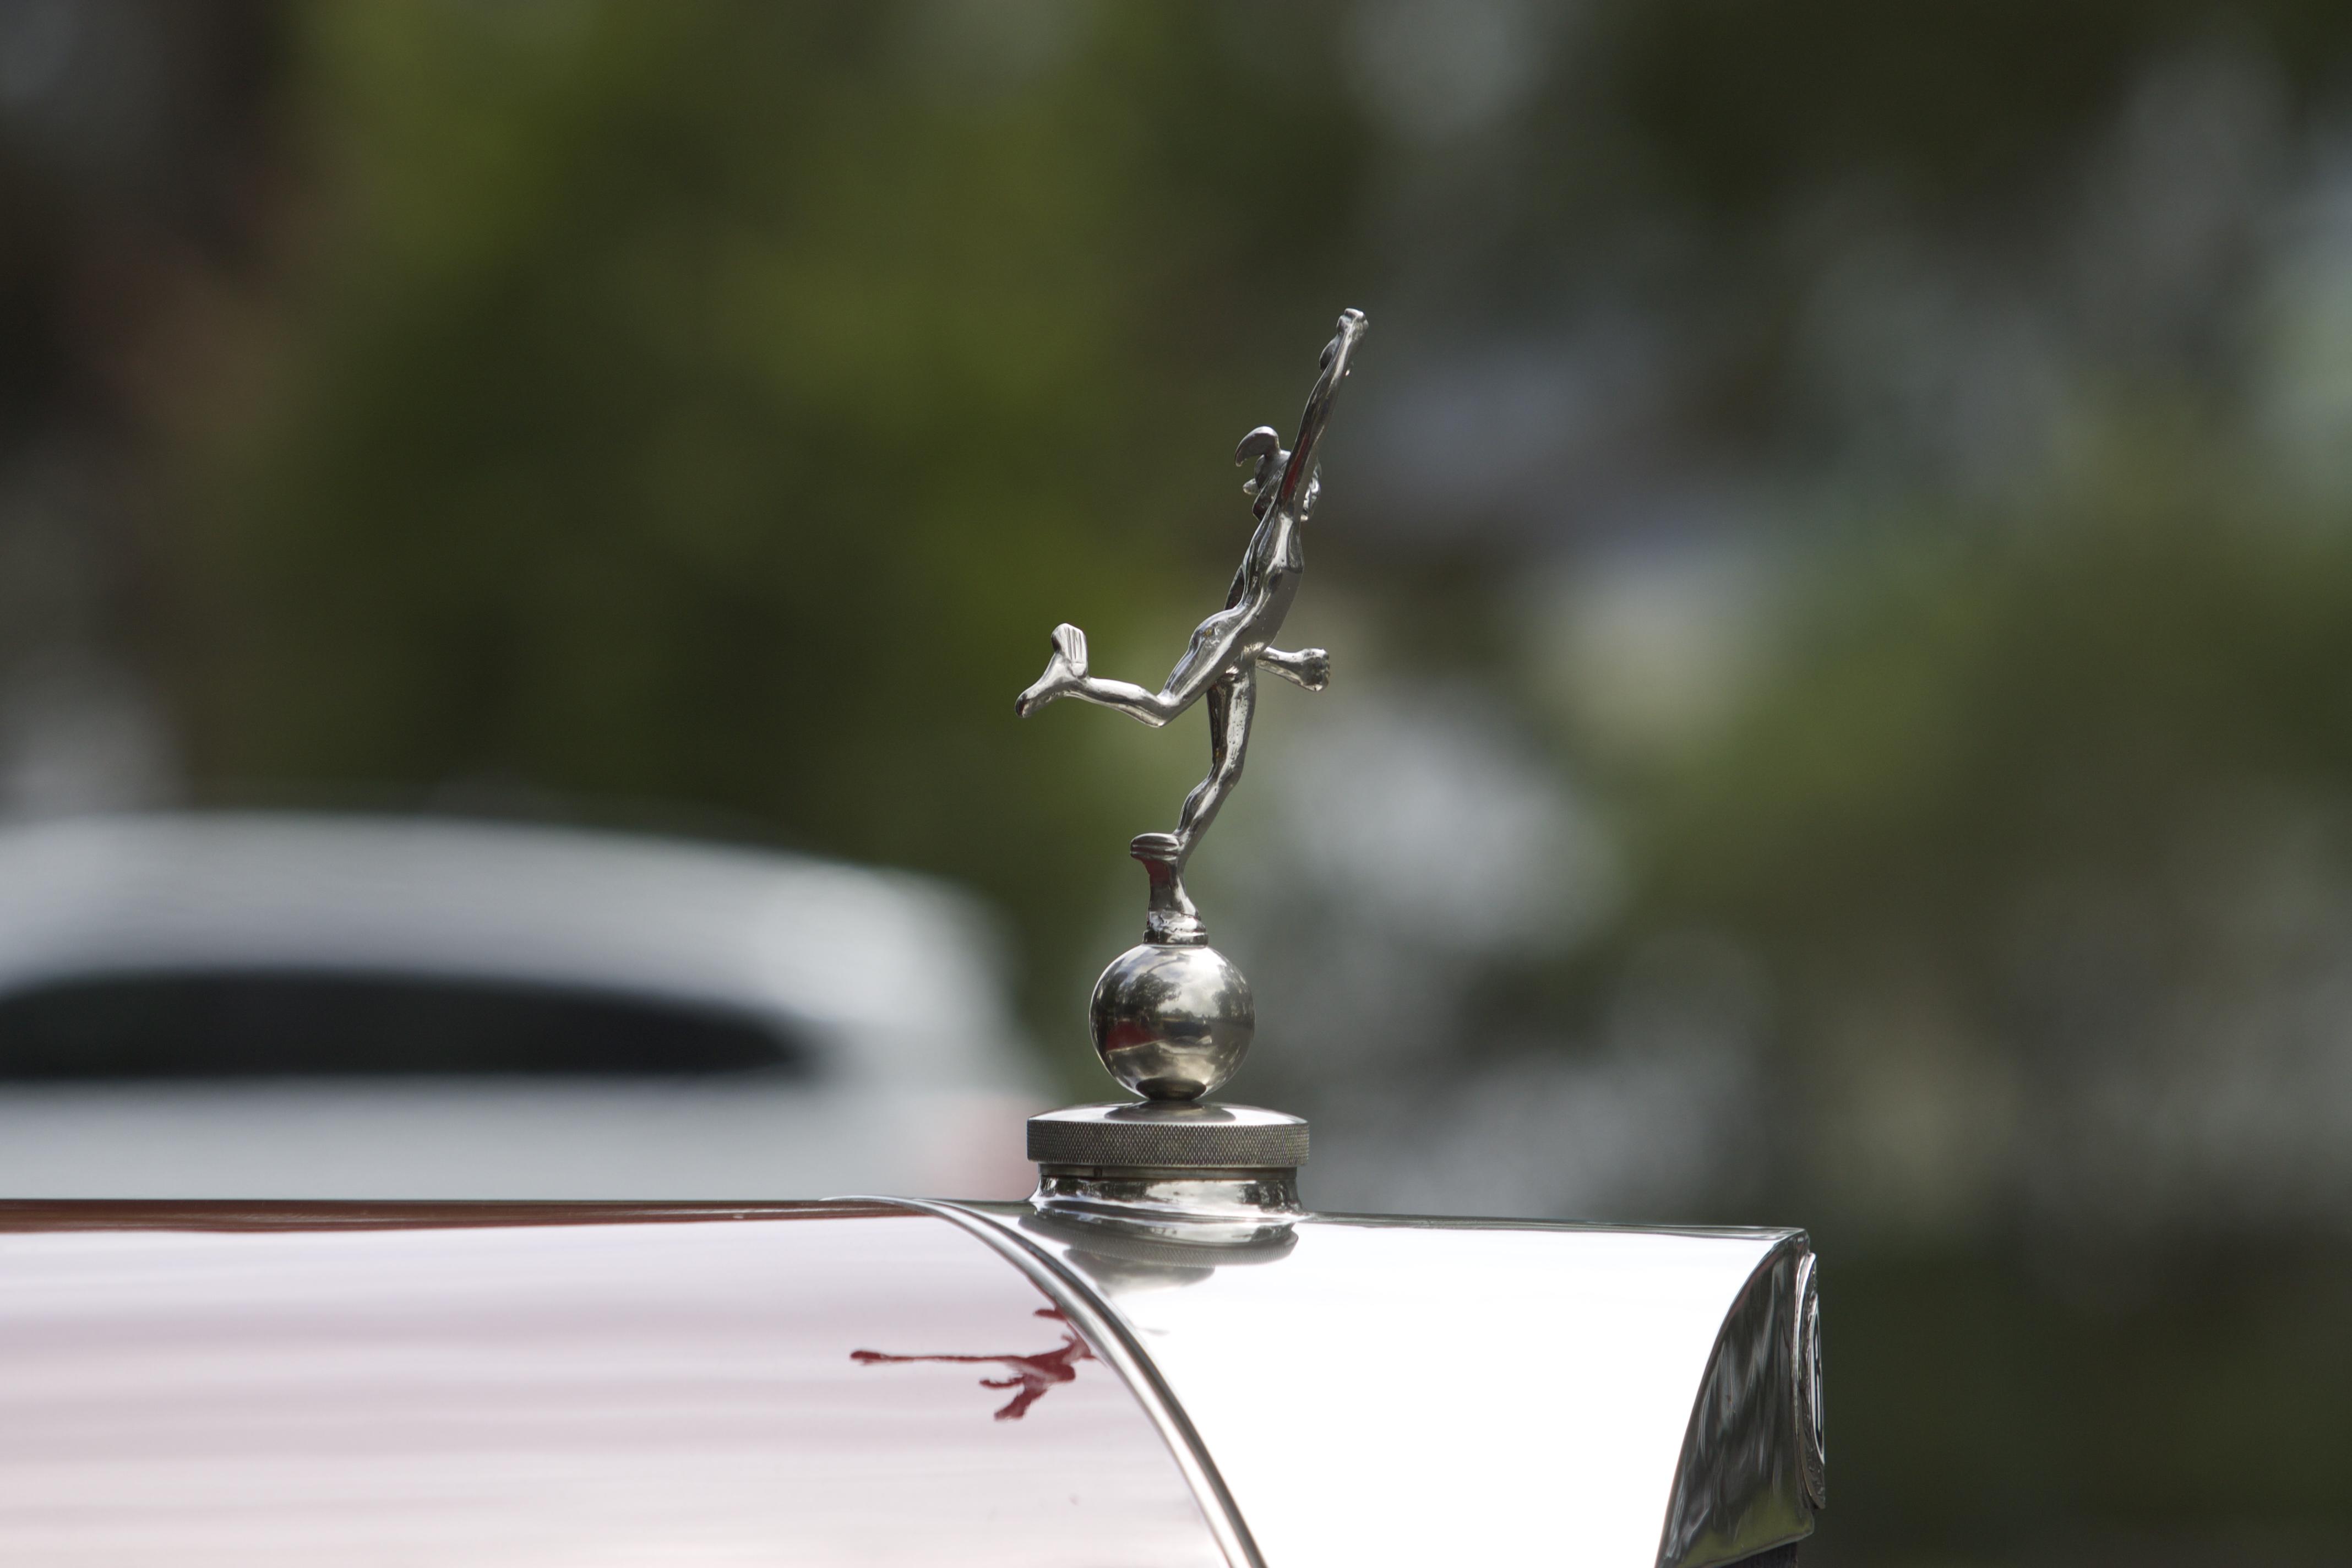 1916 Benz